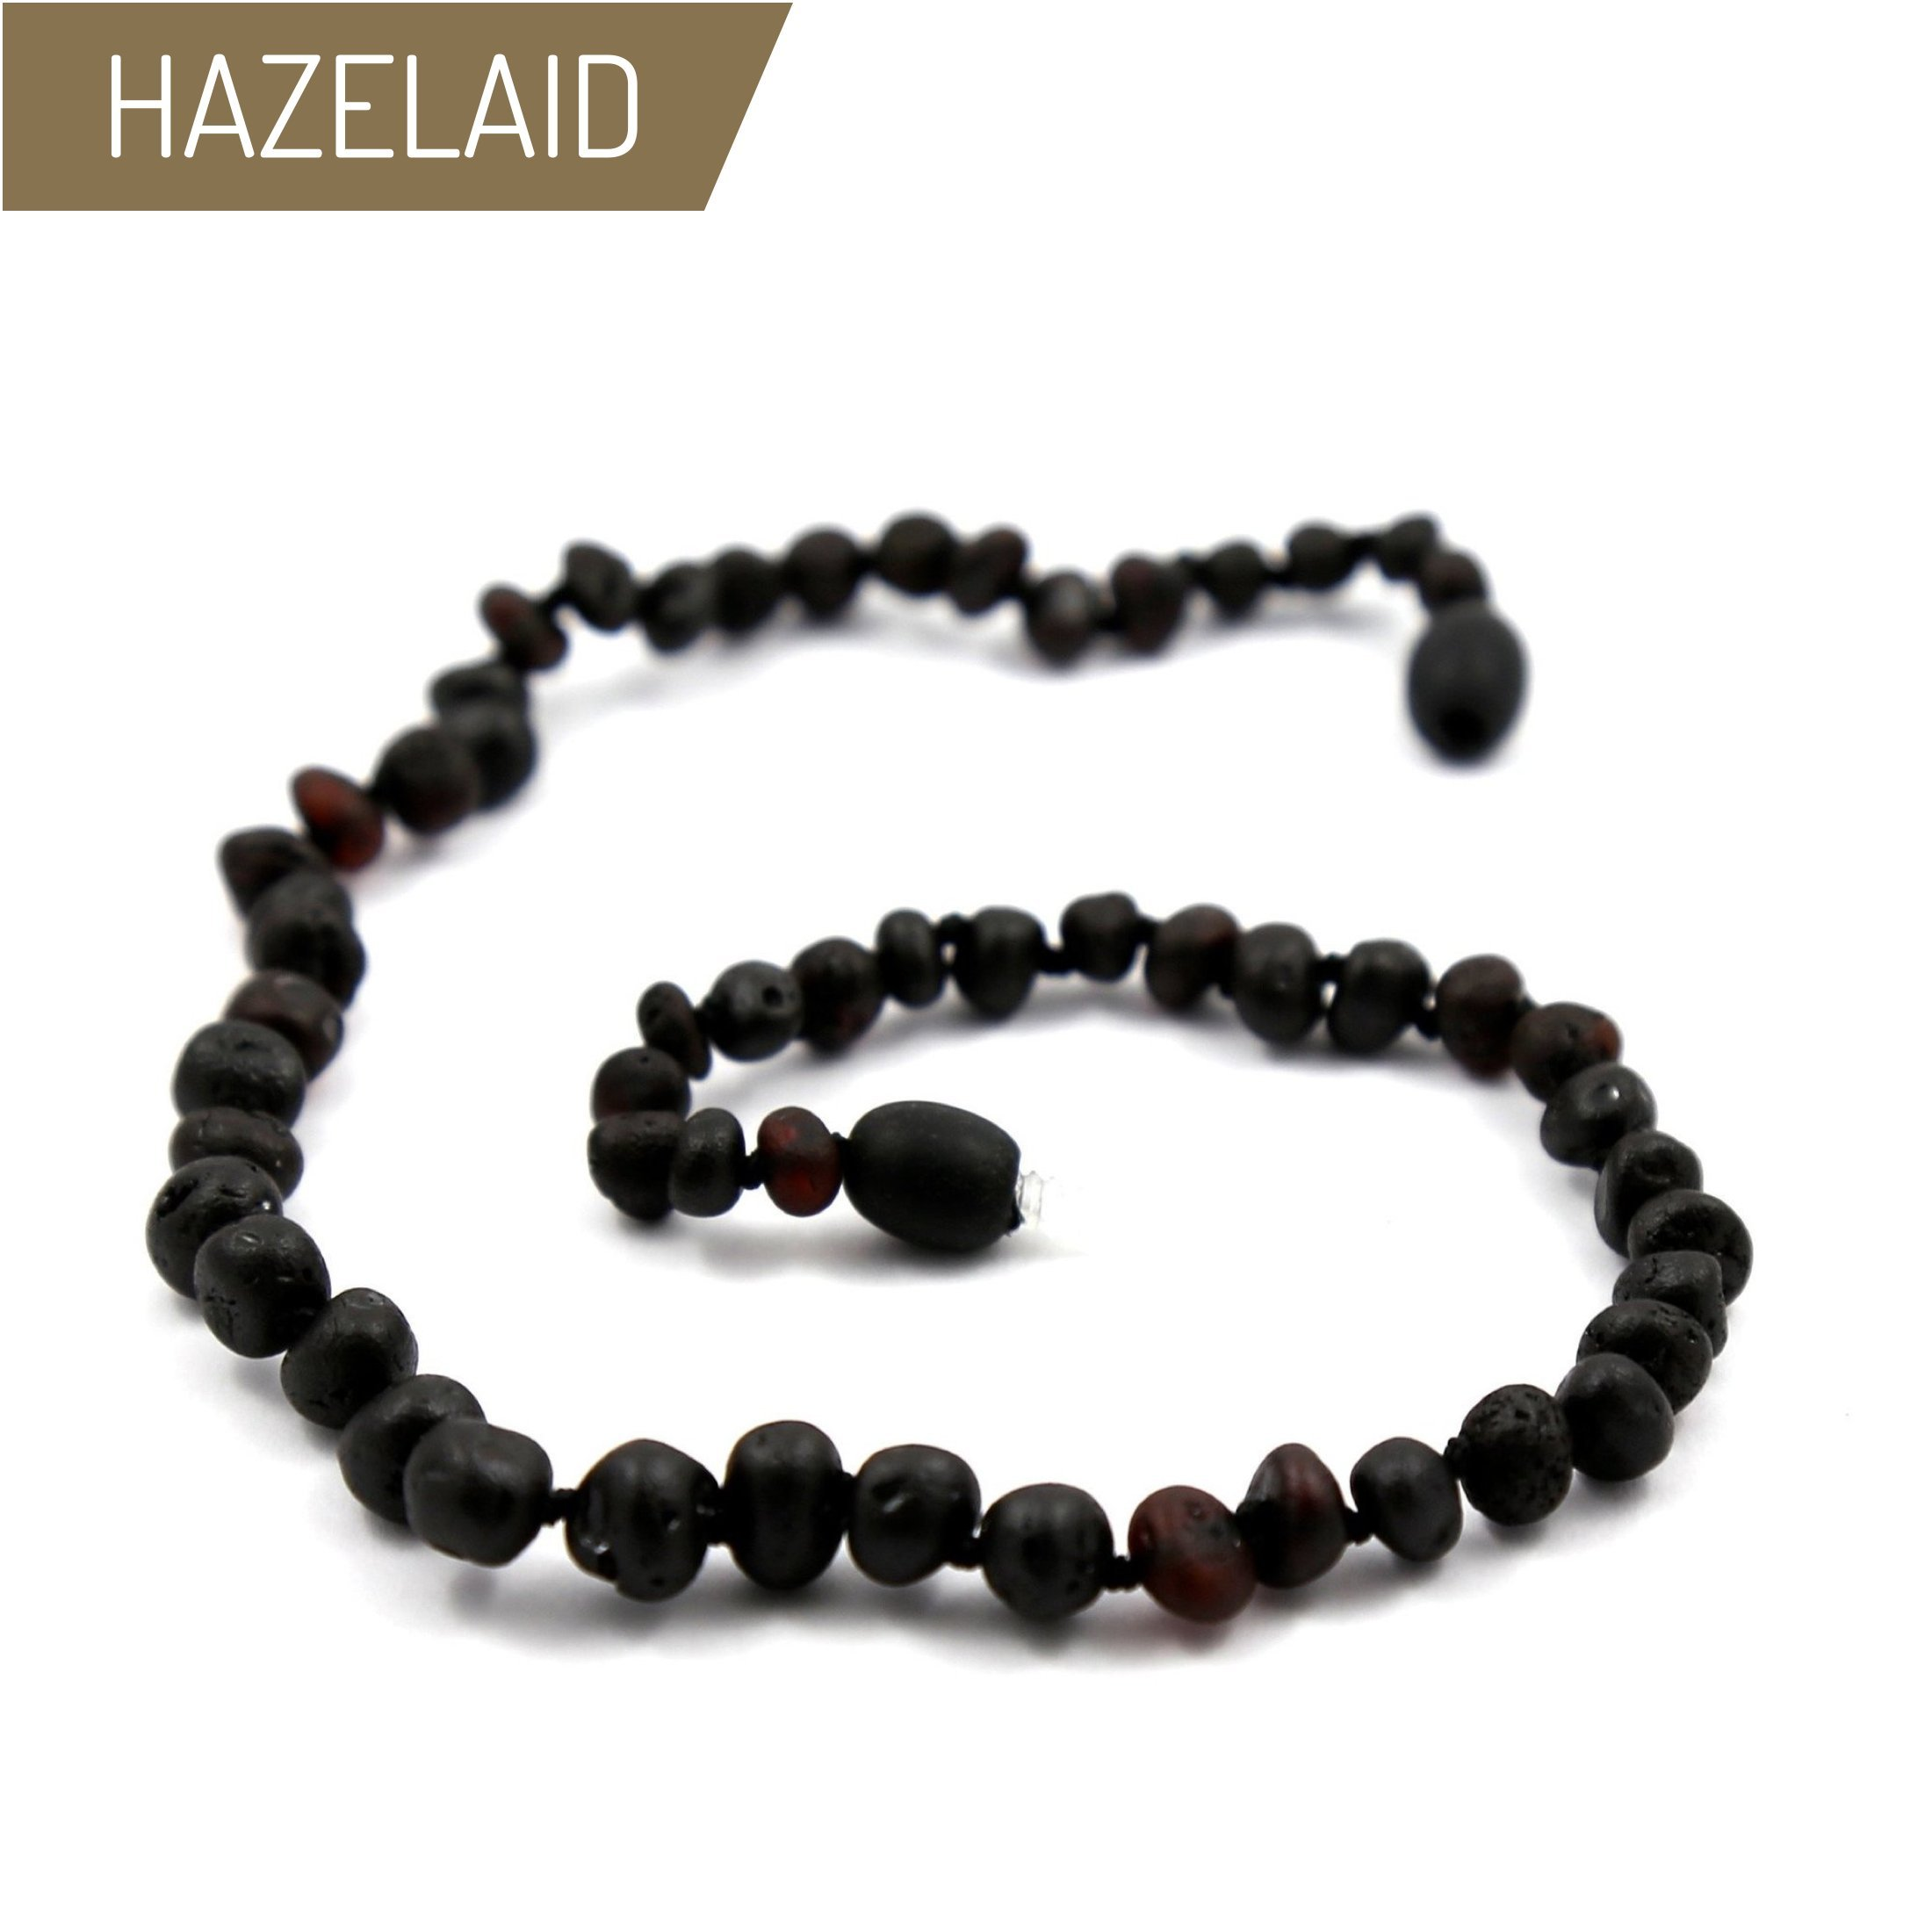 Hazelaid (TM) 12'' Baltic Amber Coffee Necklace